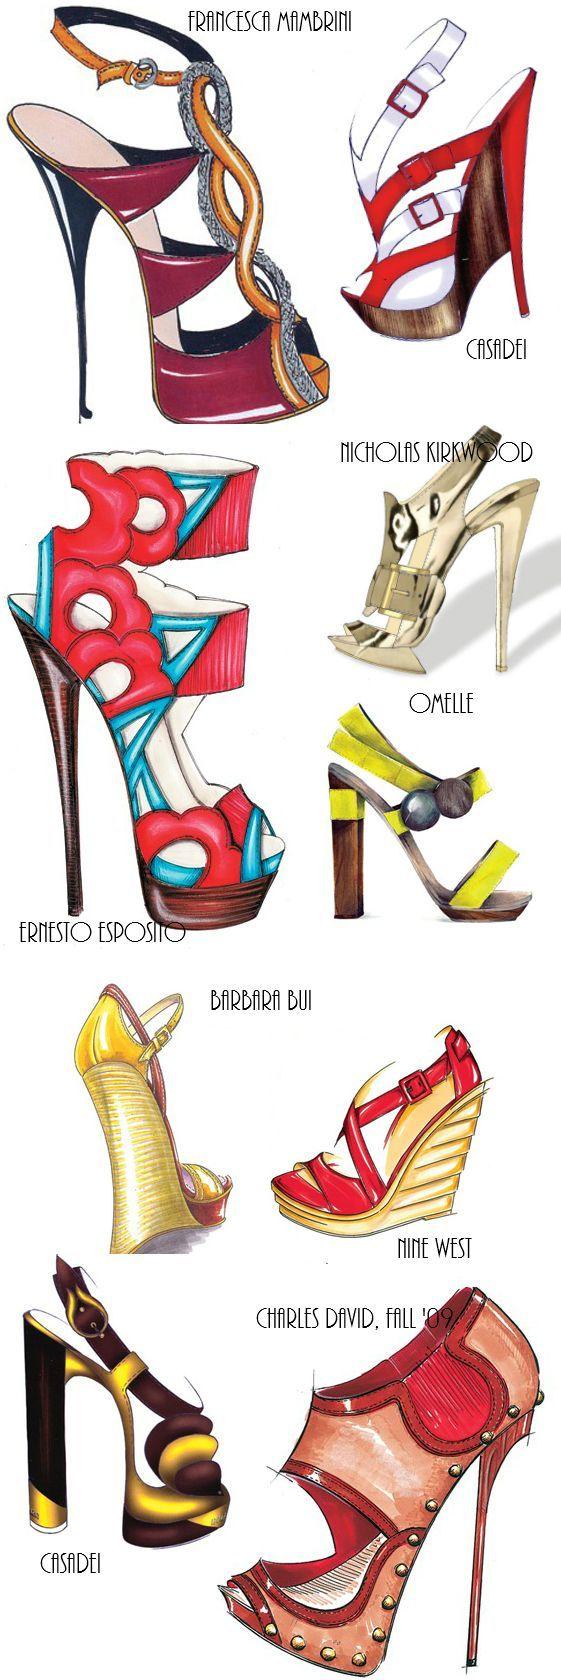 Earth ✵Wheel ✵ Sky✵ Caravan: Shoes Sketches: